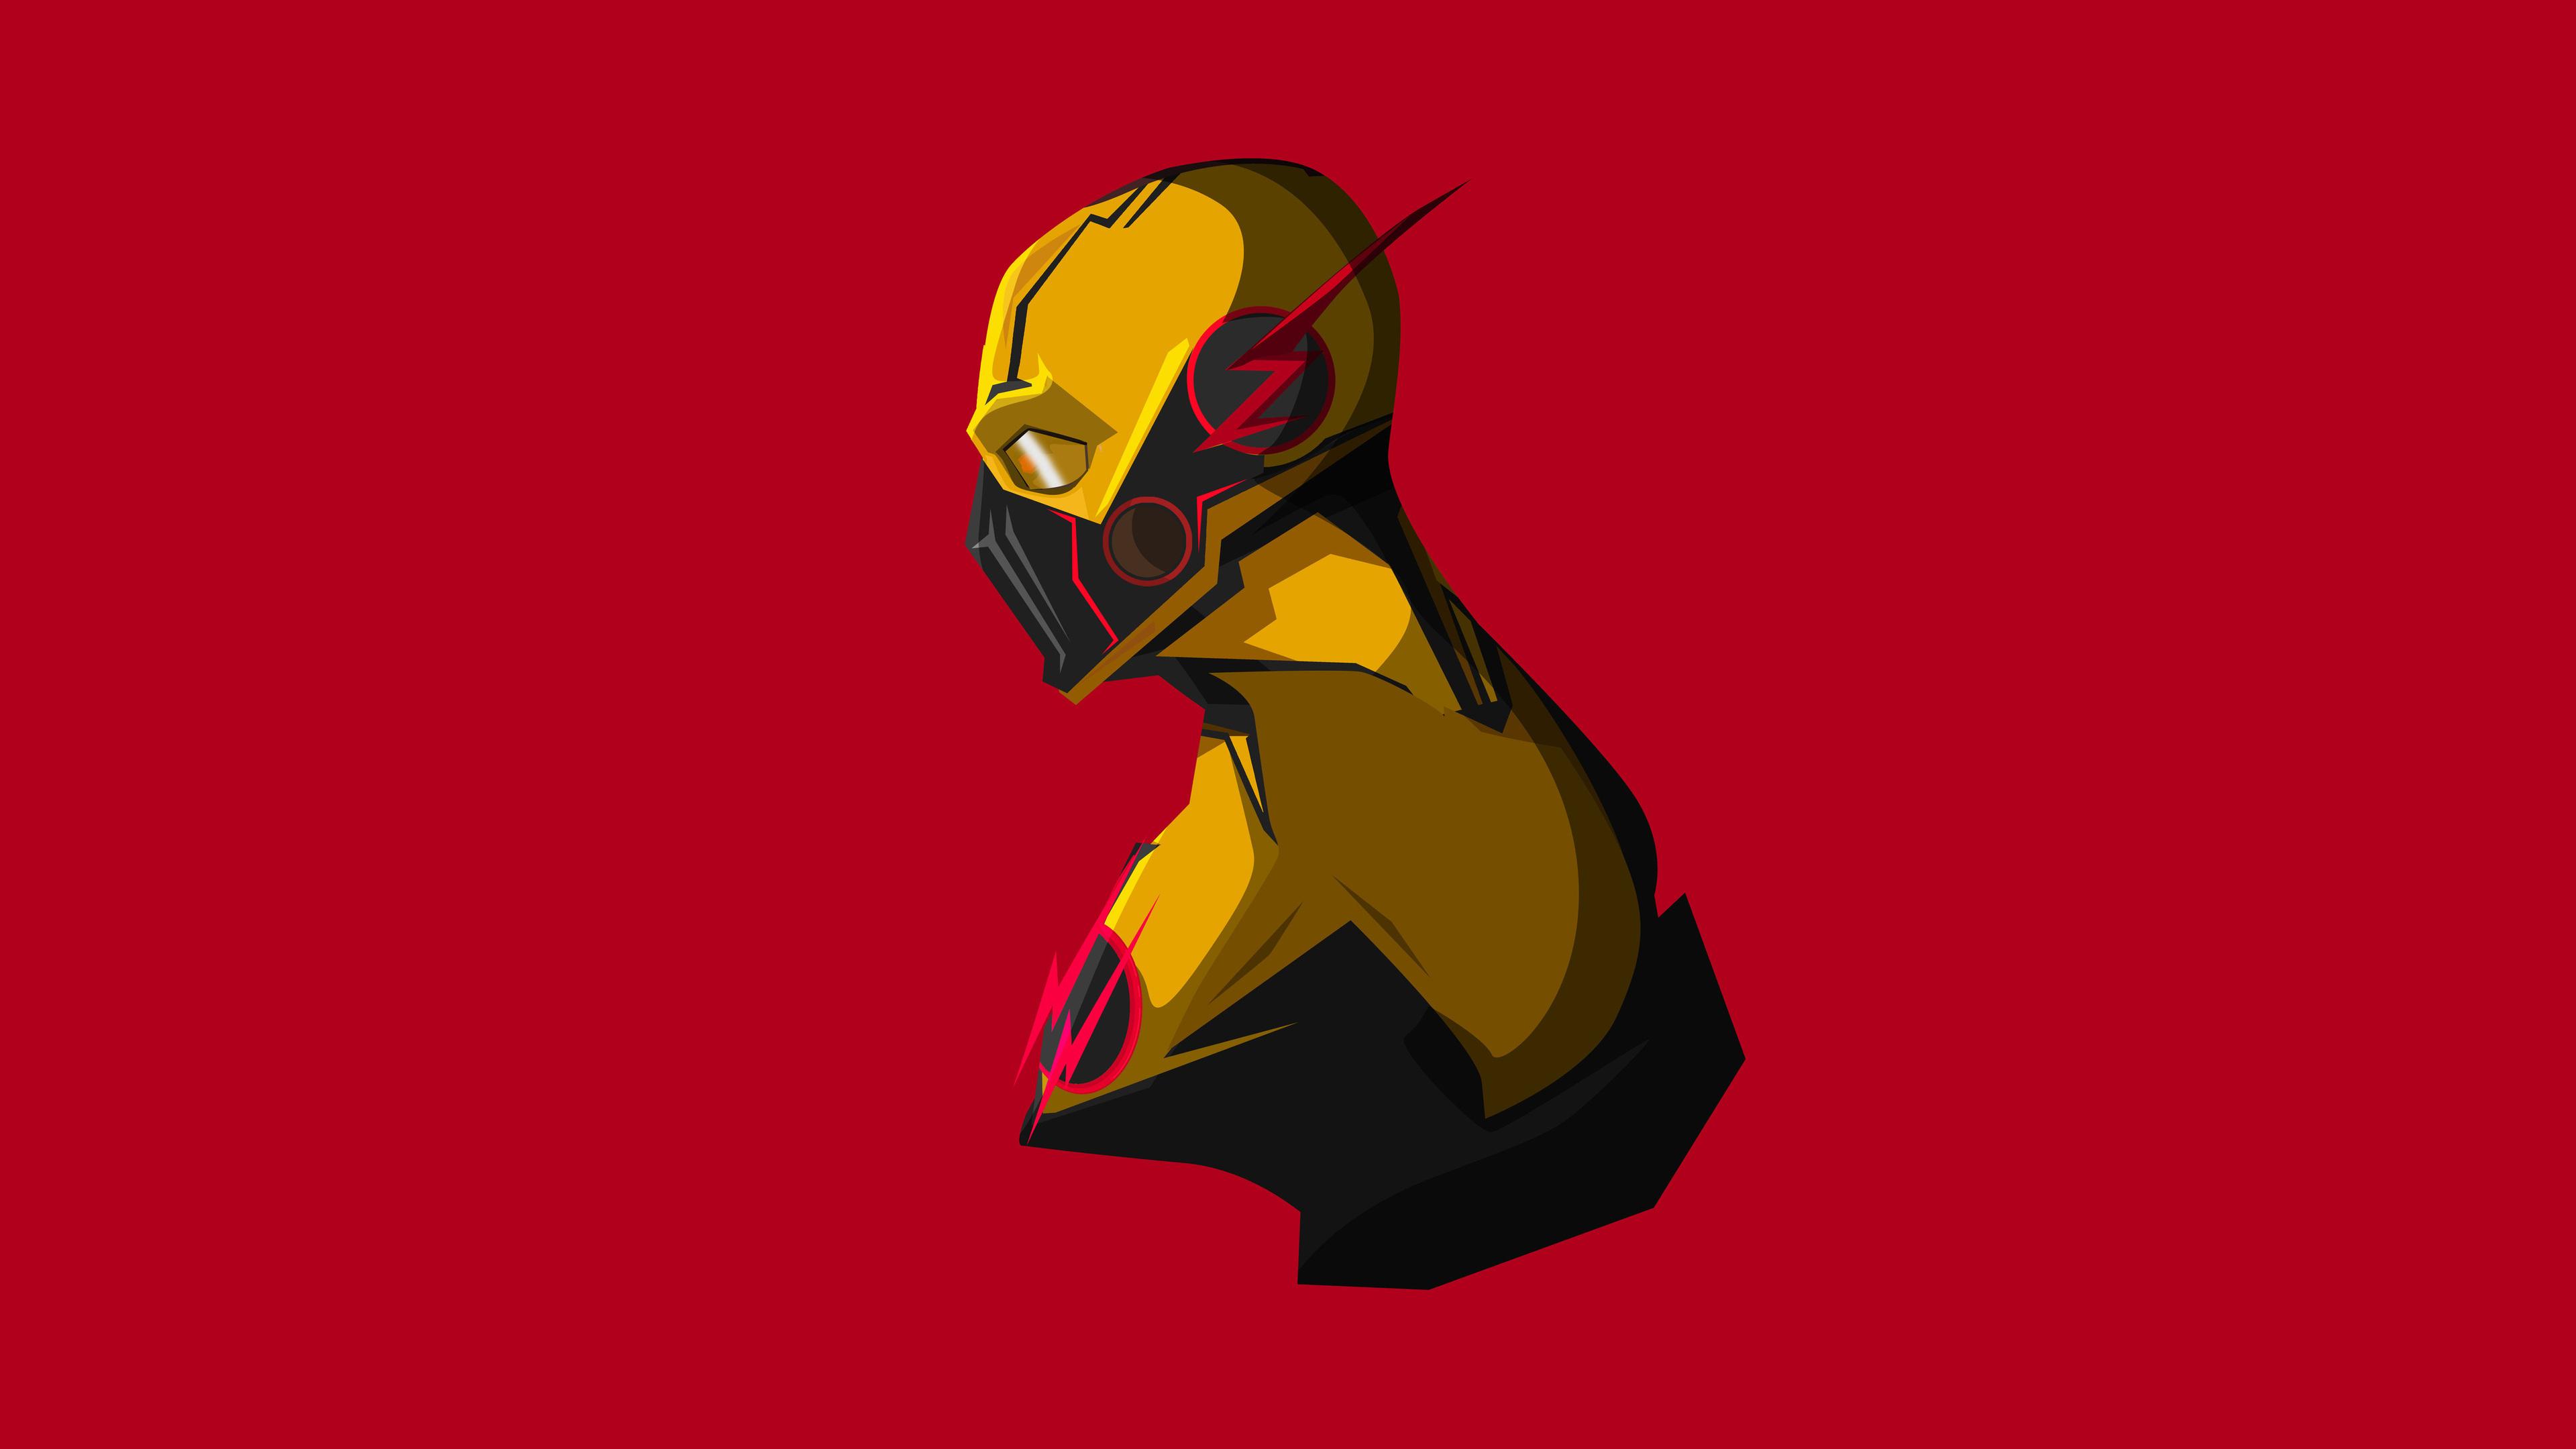 reverse-flash-minimalism-4k-xw.jpg